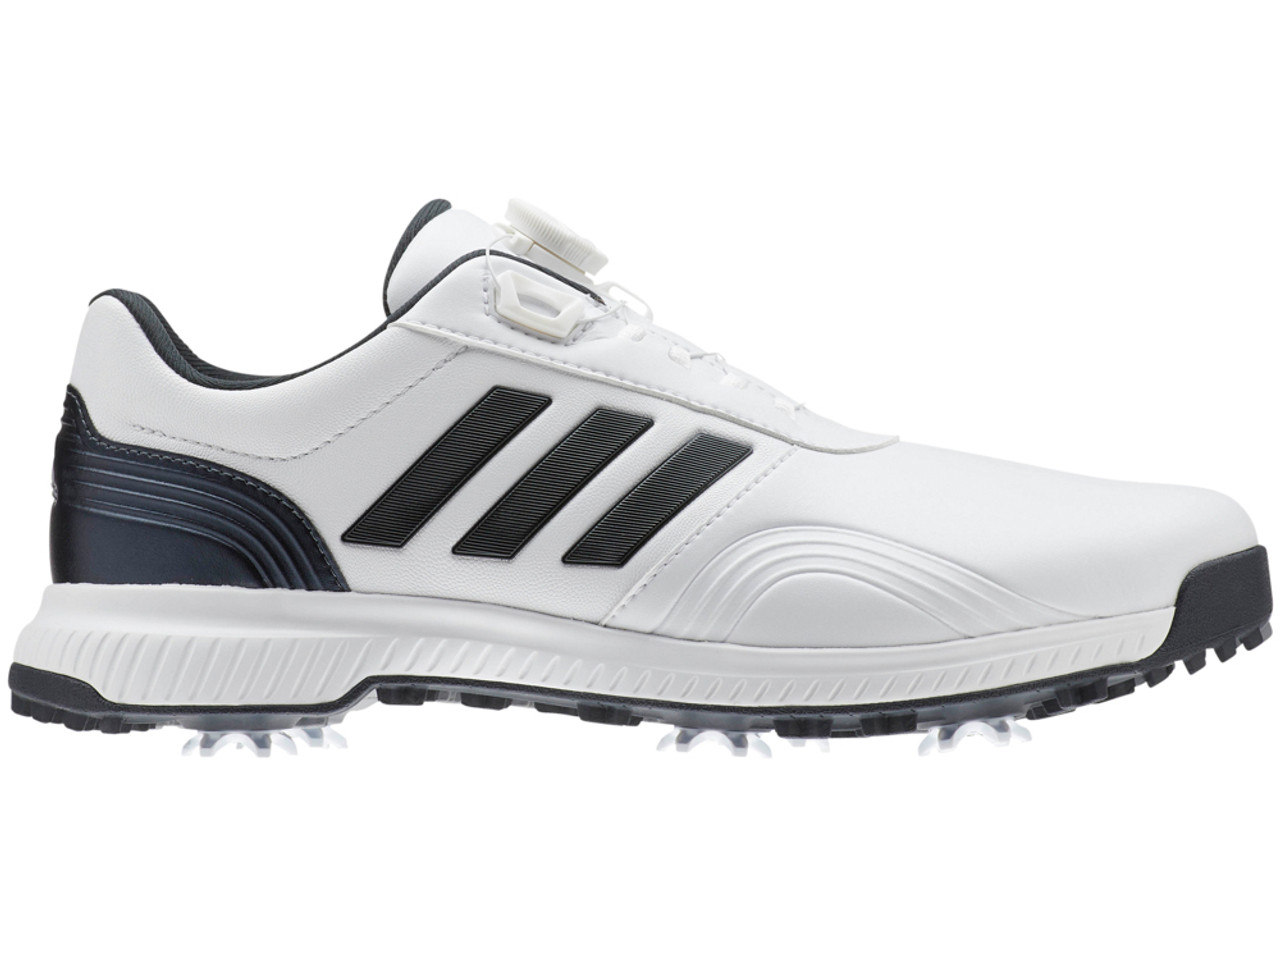 979d954916a Adidas CP Traxion BOA Golf Shoes - FTWR White Black Blue - Mens For ...